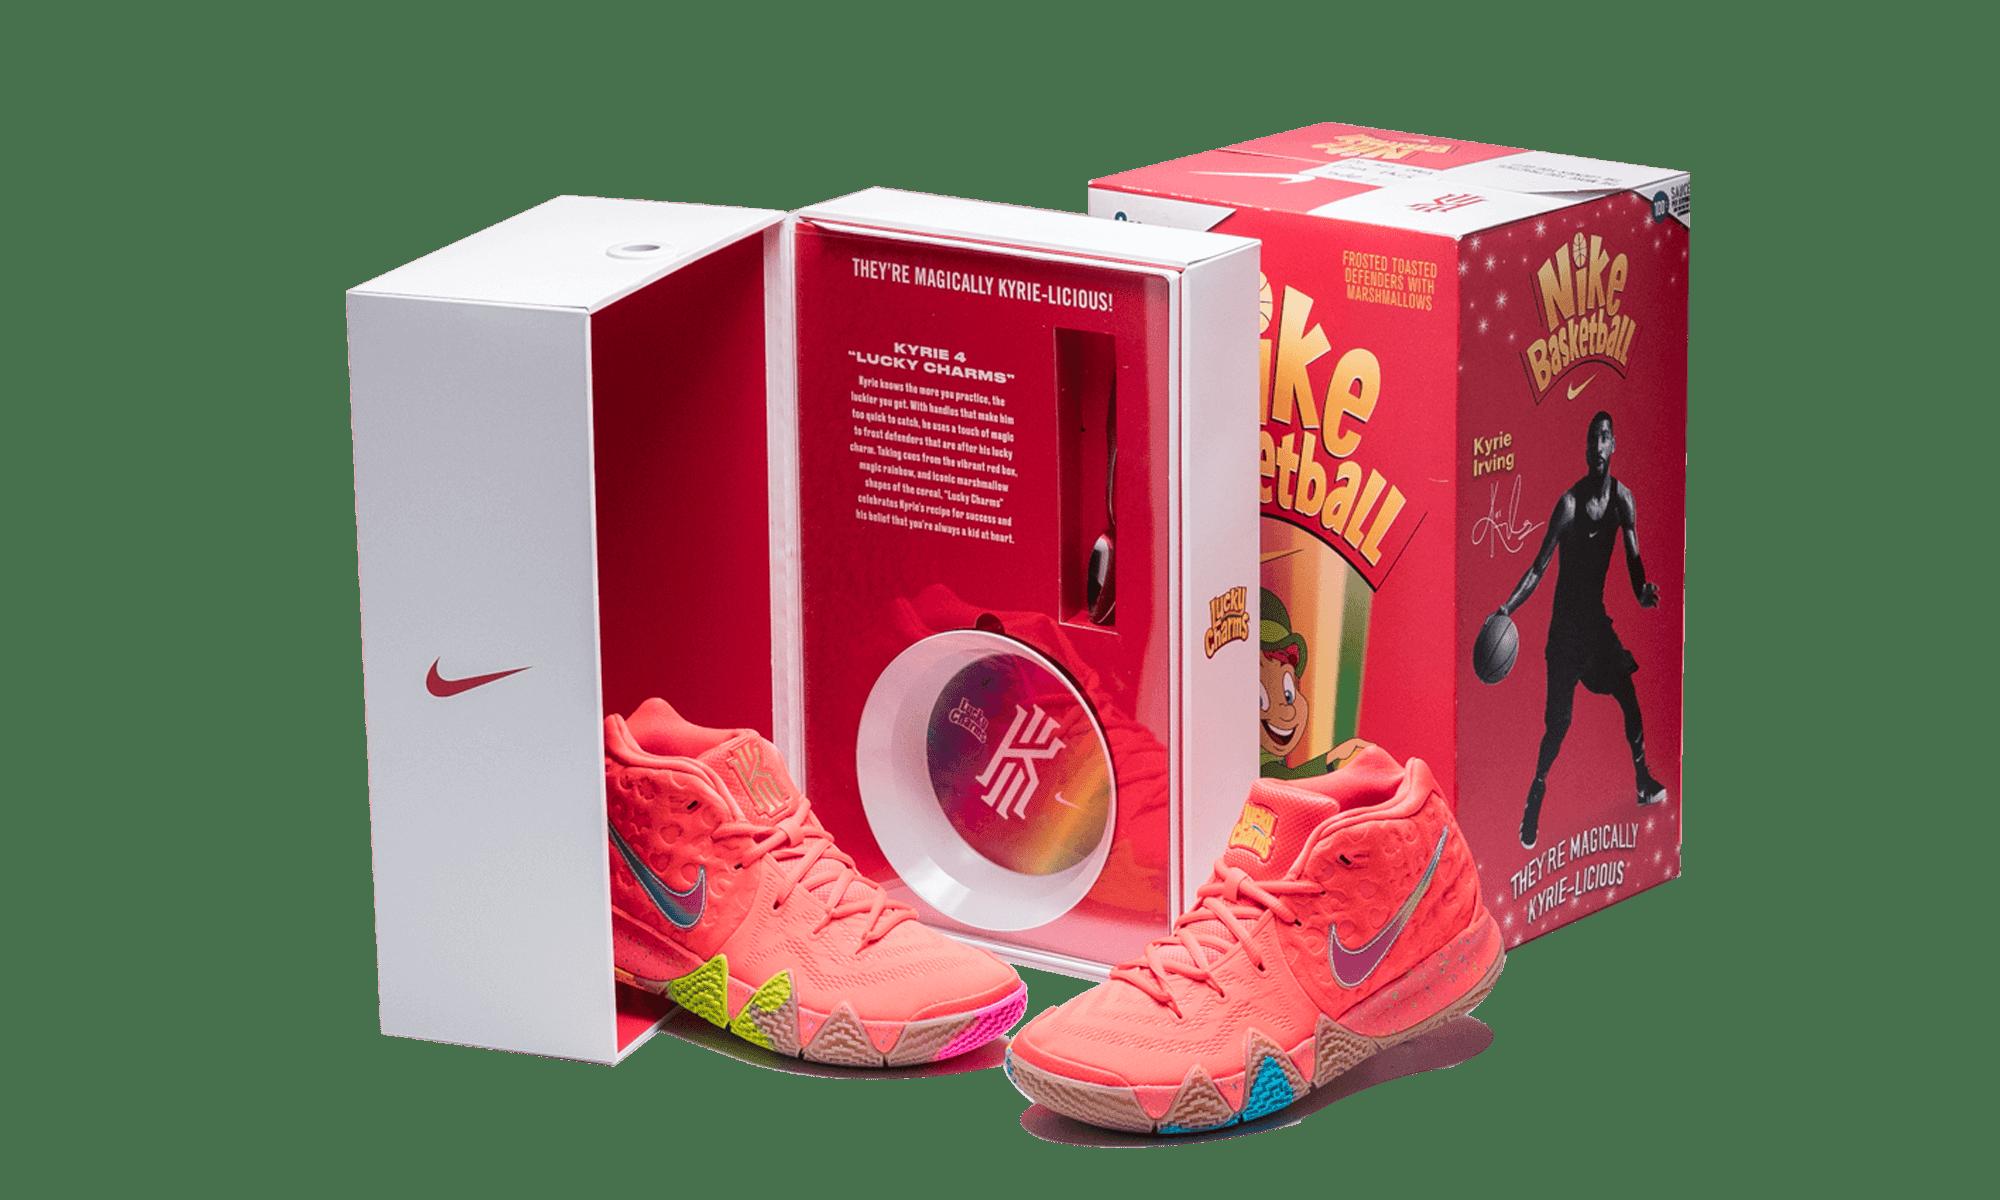 síndrome Al aire libre Como  15 Special Sneaker Boxes: Chunky Dunky, Clot AF1 & More | Complex